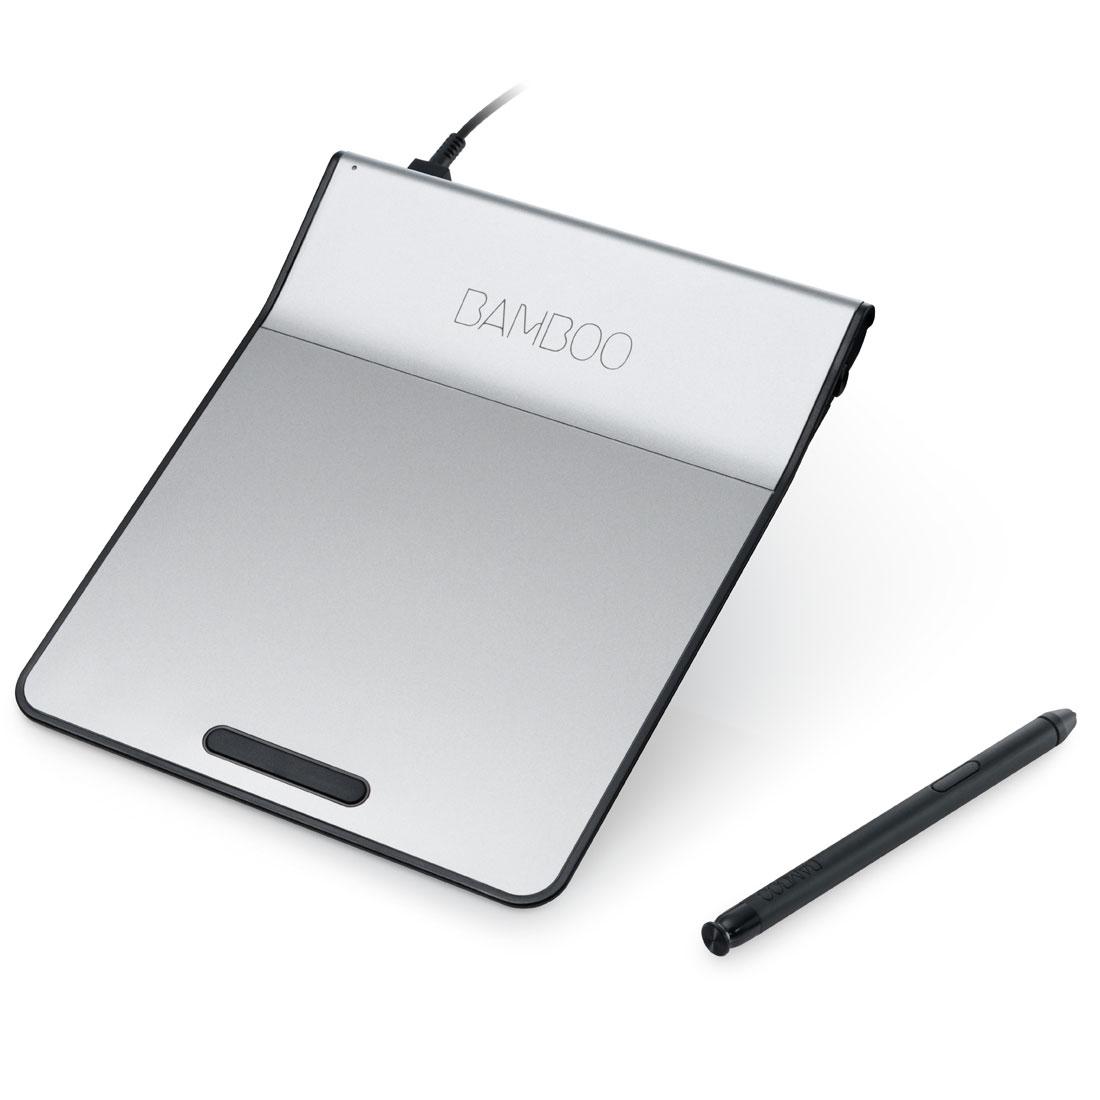 wacom bamboo pad usb tablette graphique wacom sur ldlc. Black Bedroom Furniture Sets. Home Design Ideas